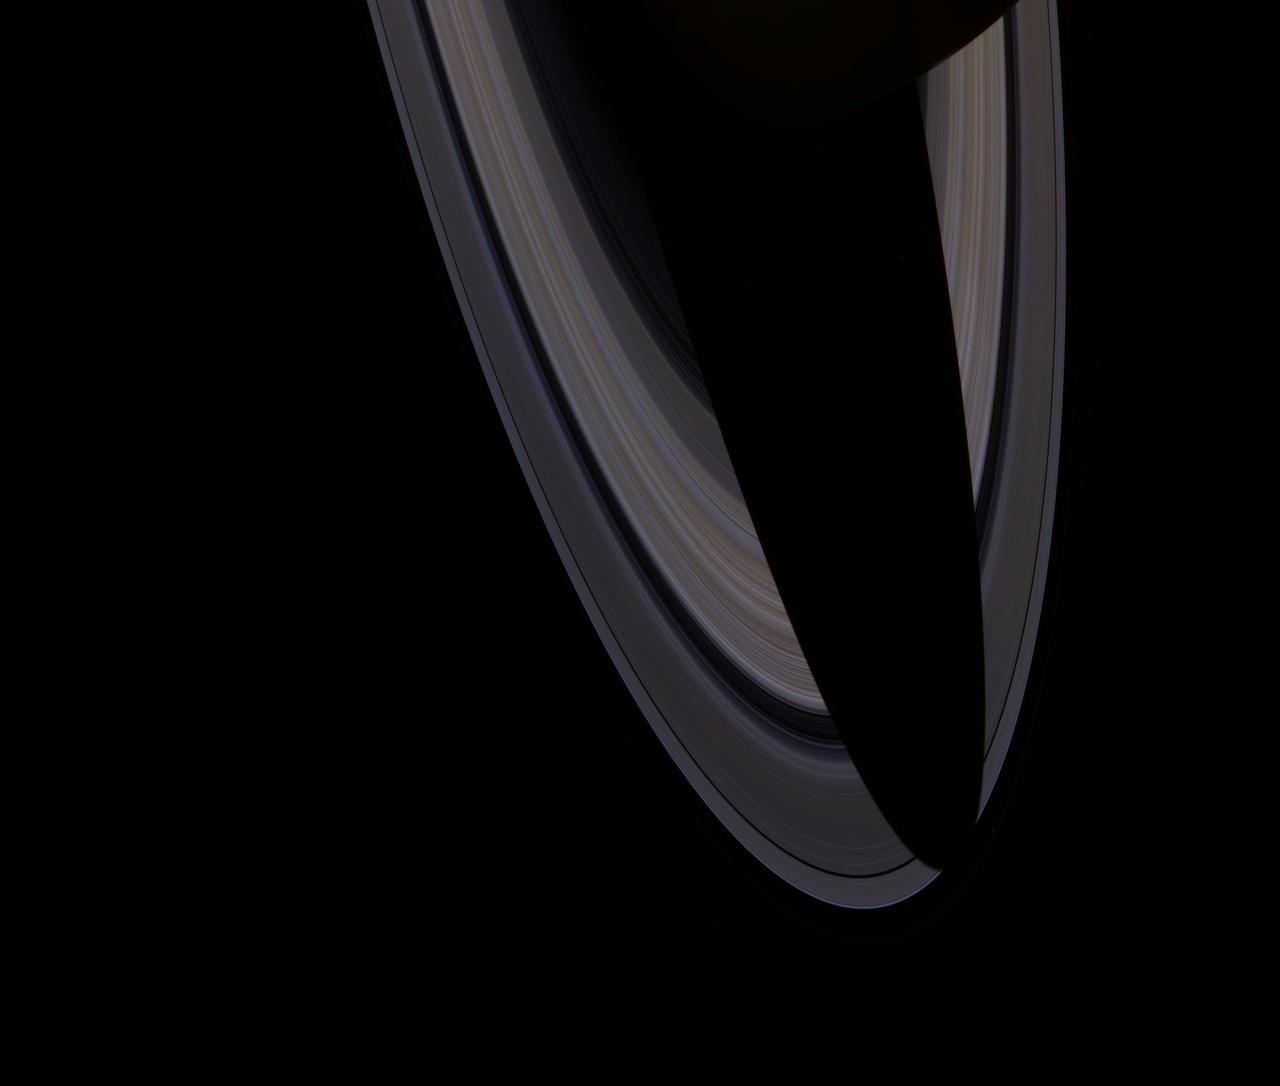 anel, astronomia, and planeta image